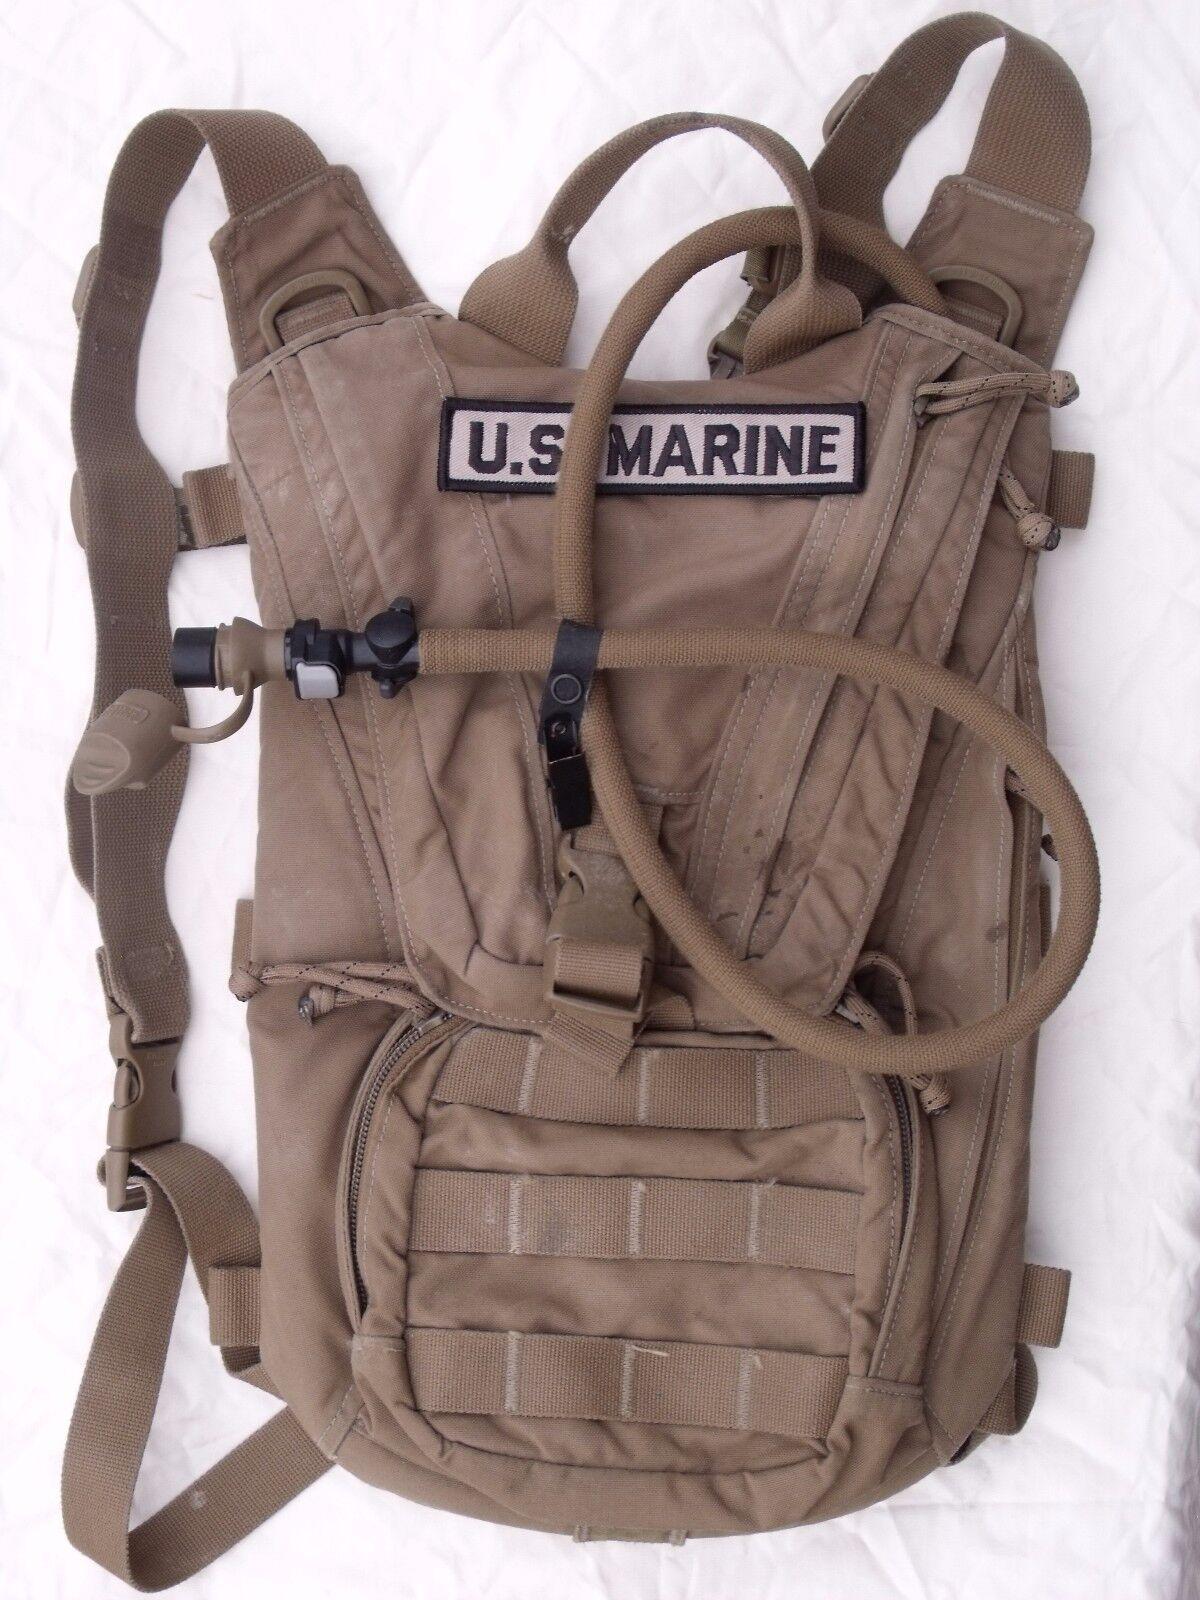 USMC FILBE Hydration System Carrier 3 L 100 oz Bladder  Coyote Marine Camelbak